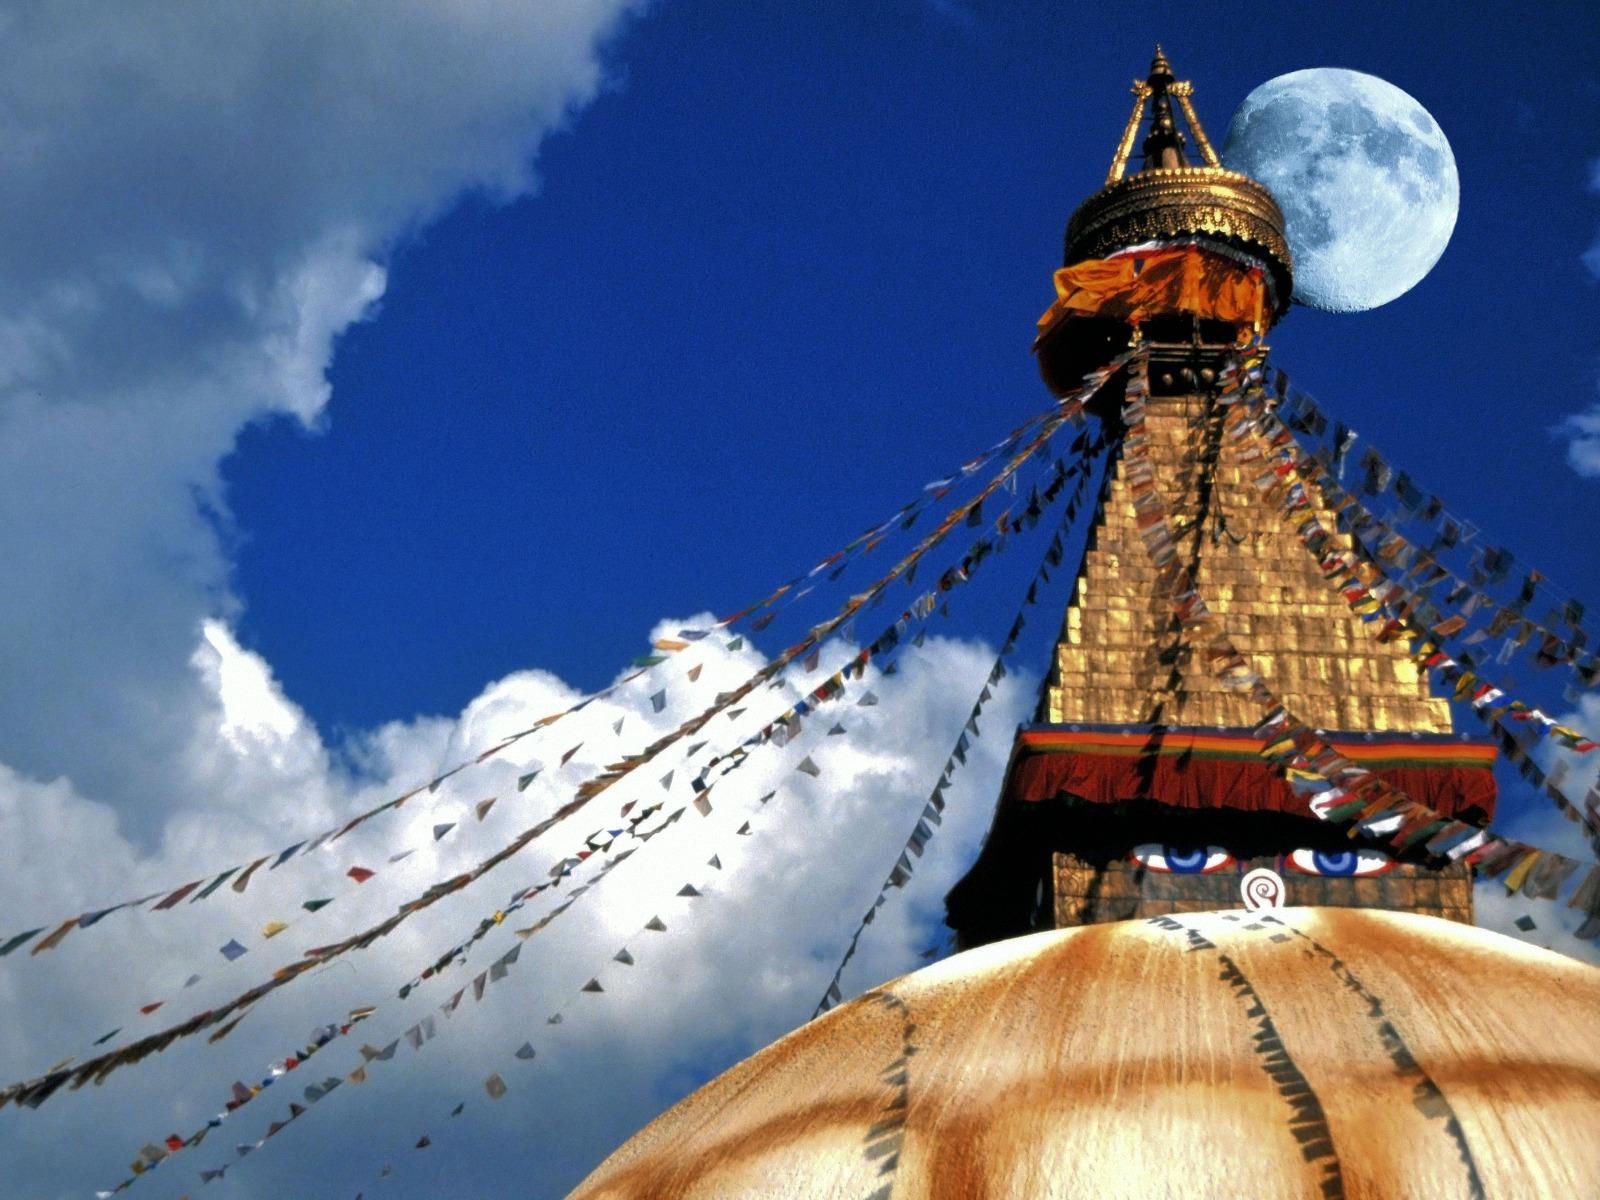 Kathmandu Sky wallpapers Kathmandu Sky stock photos 1600x1200